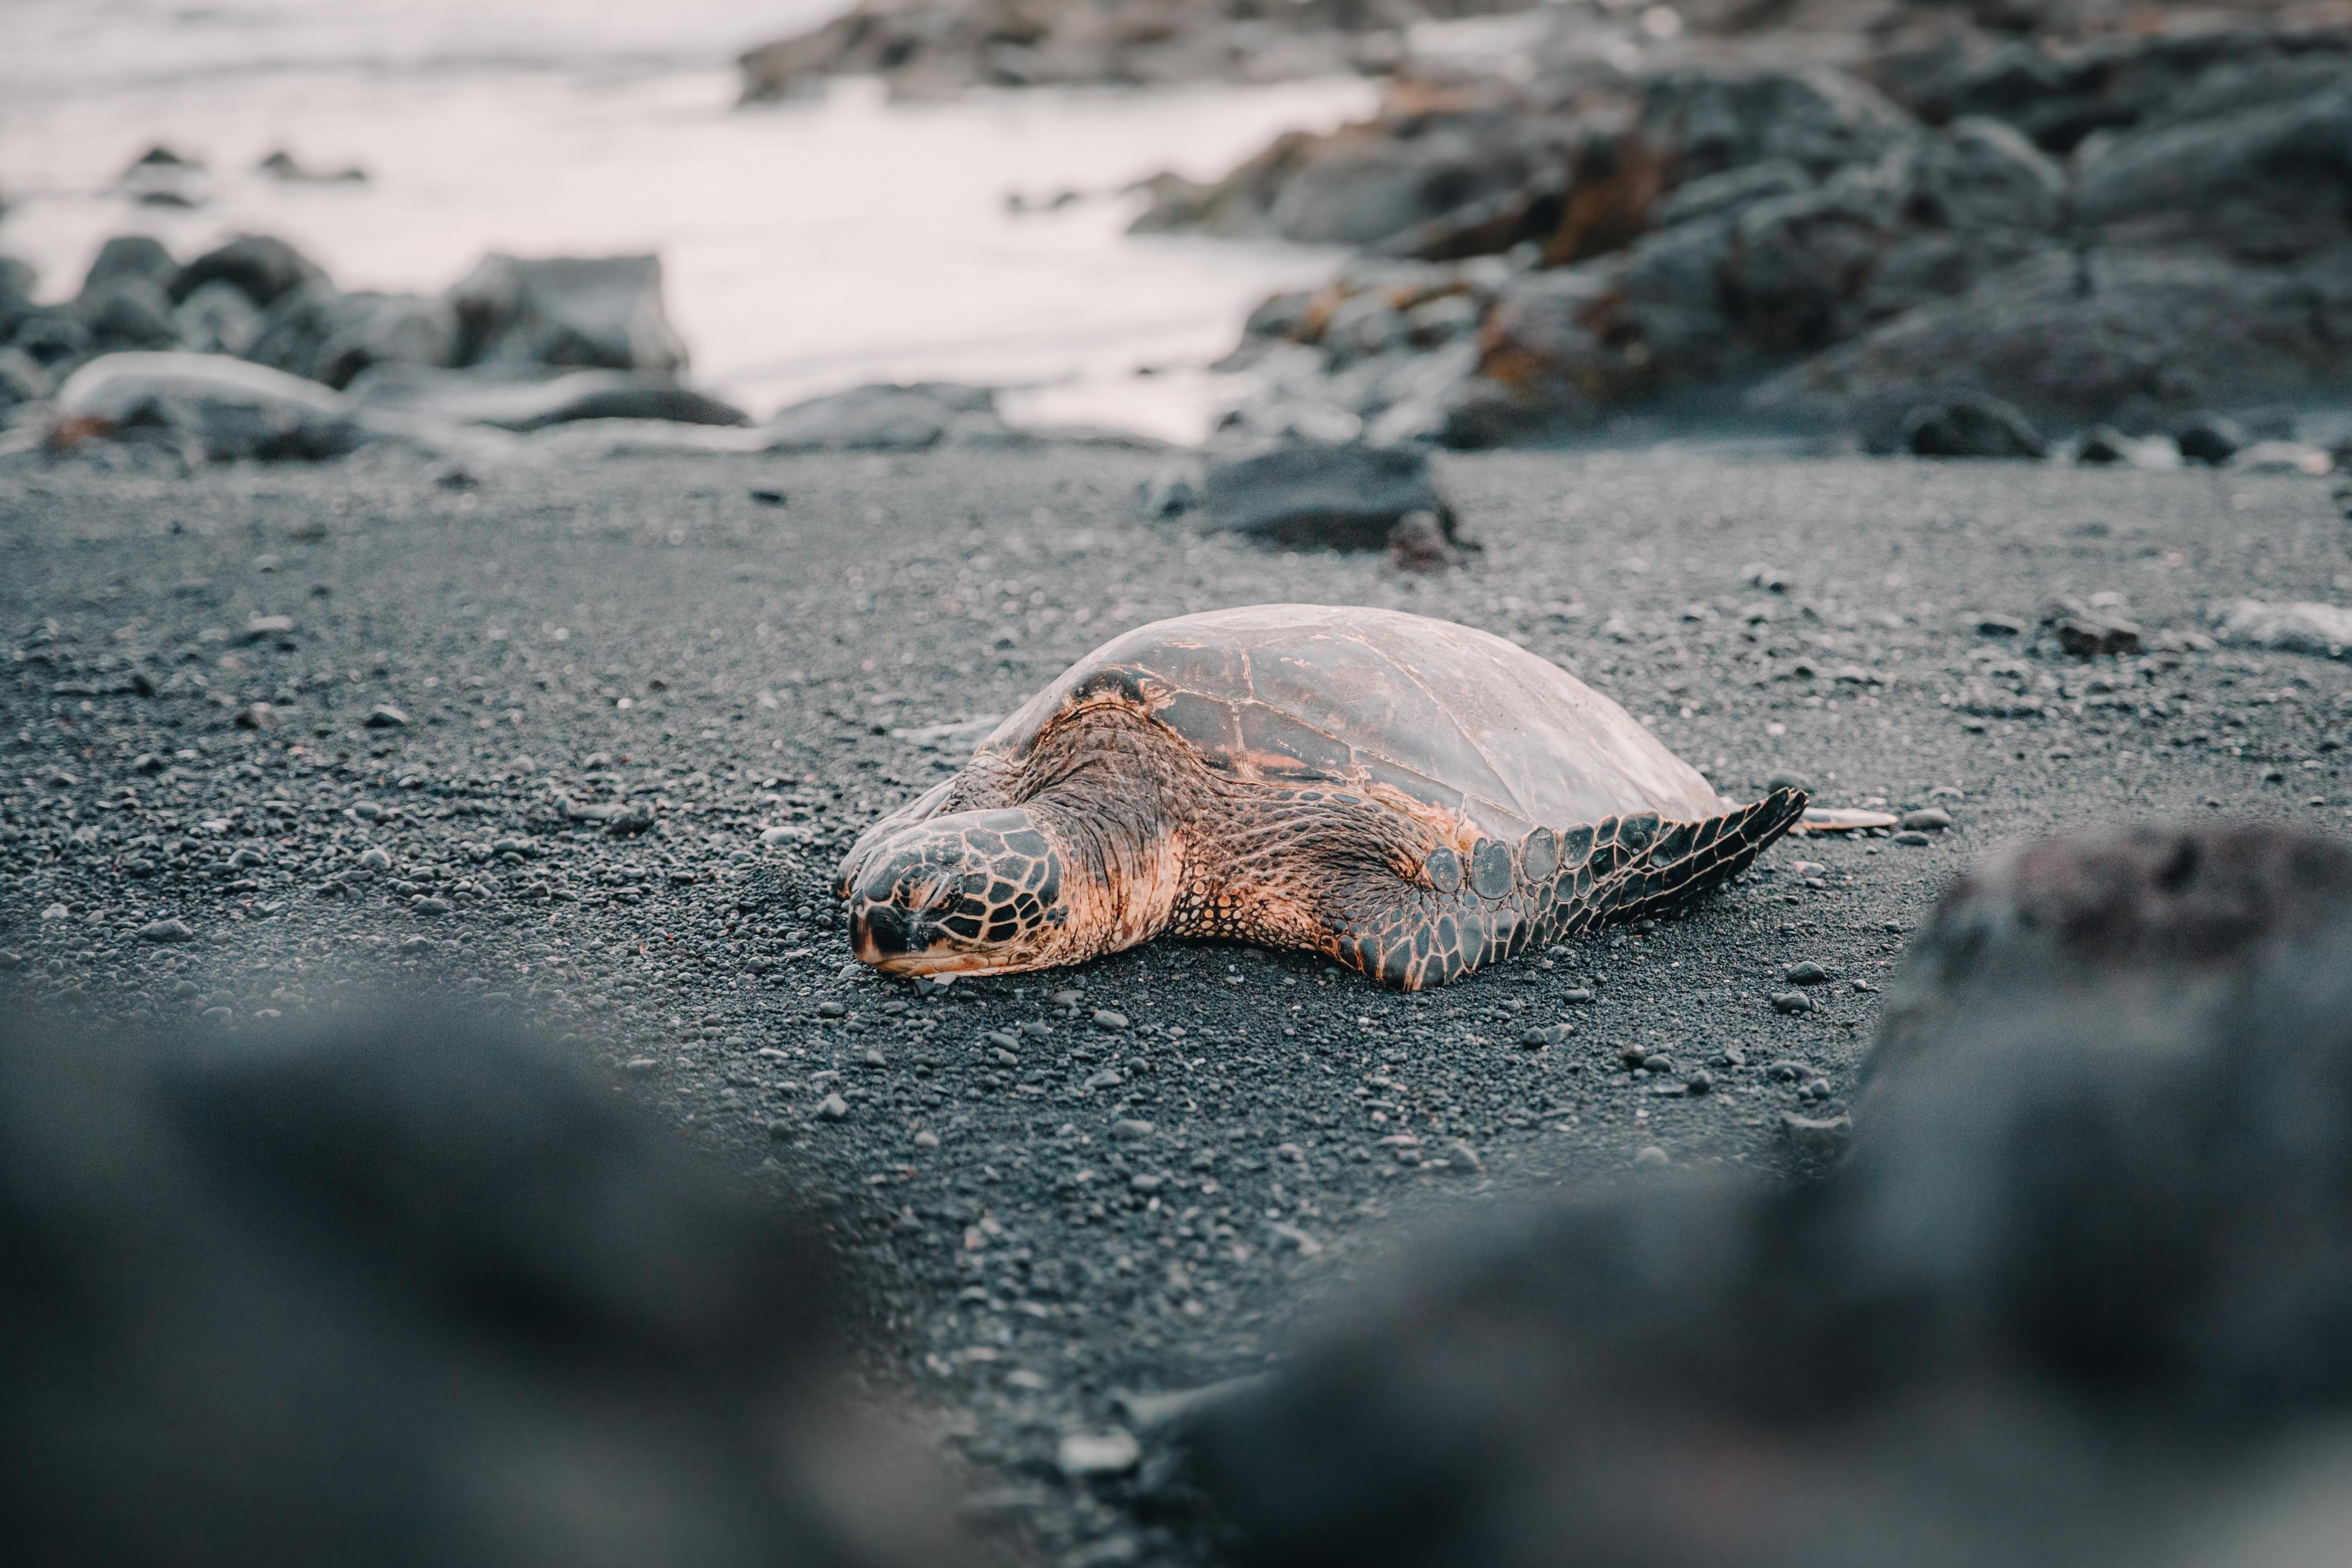 Summer Program - Surfing | Pacific Discovery: Hawaii Mini Semester Program